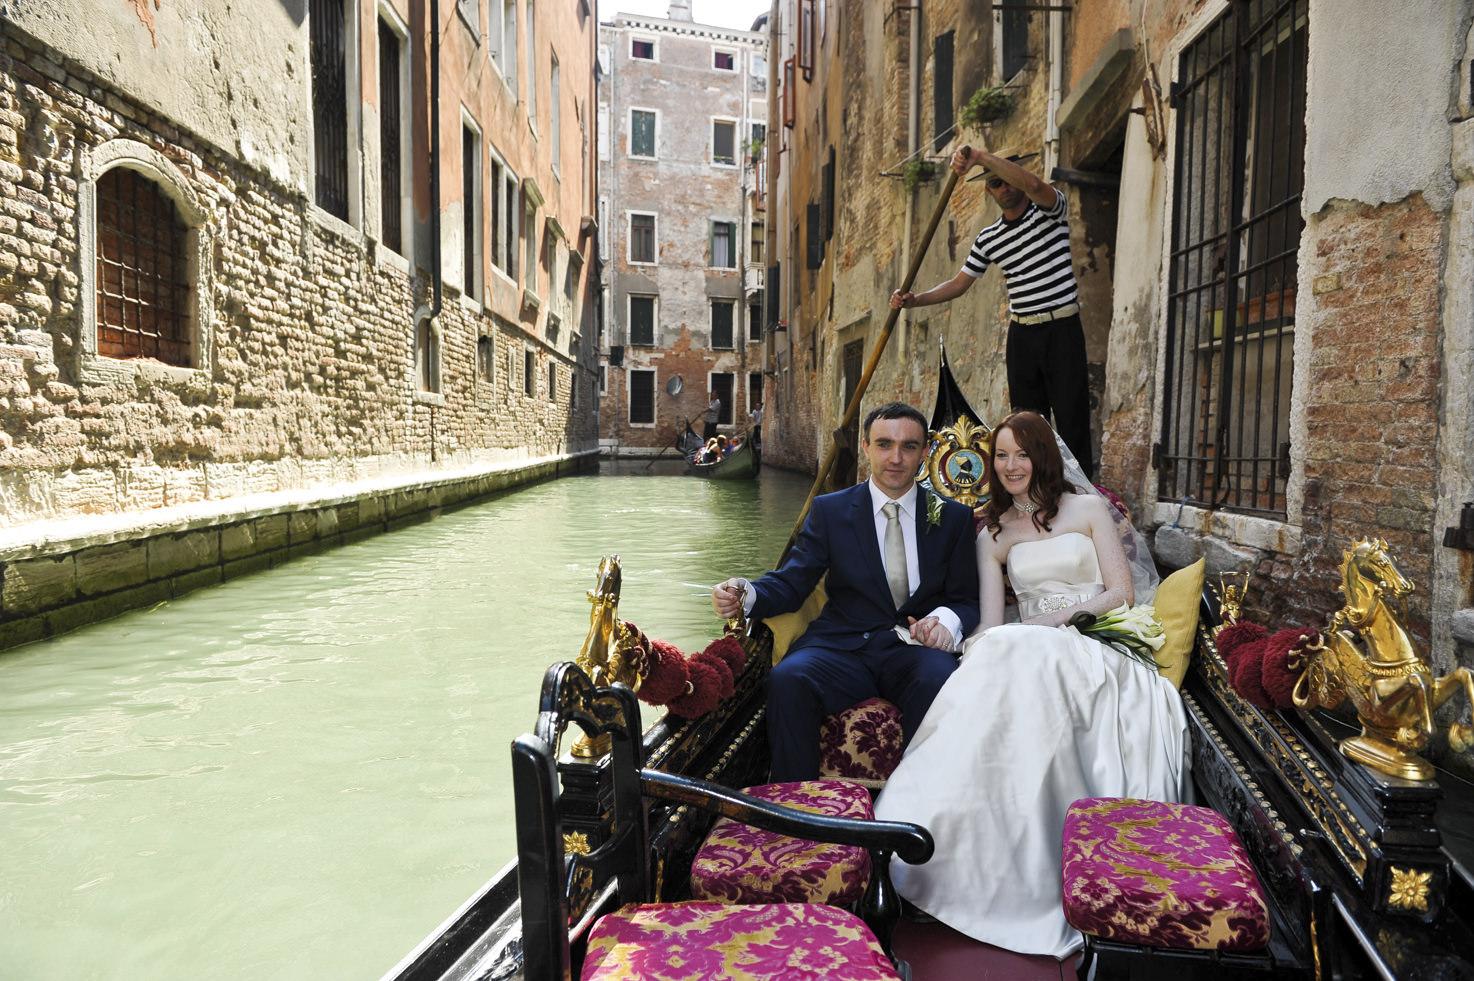 Bride and groom on a gondola